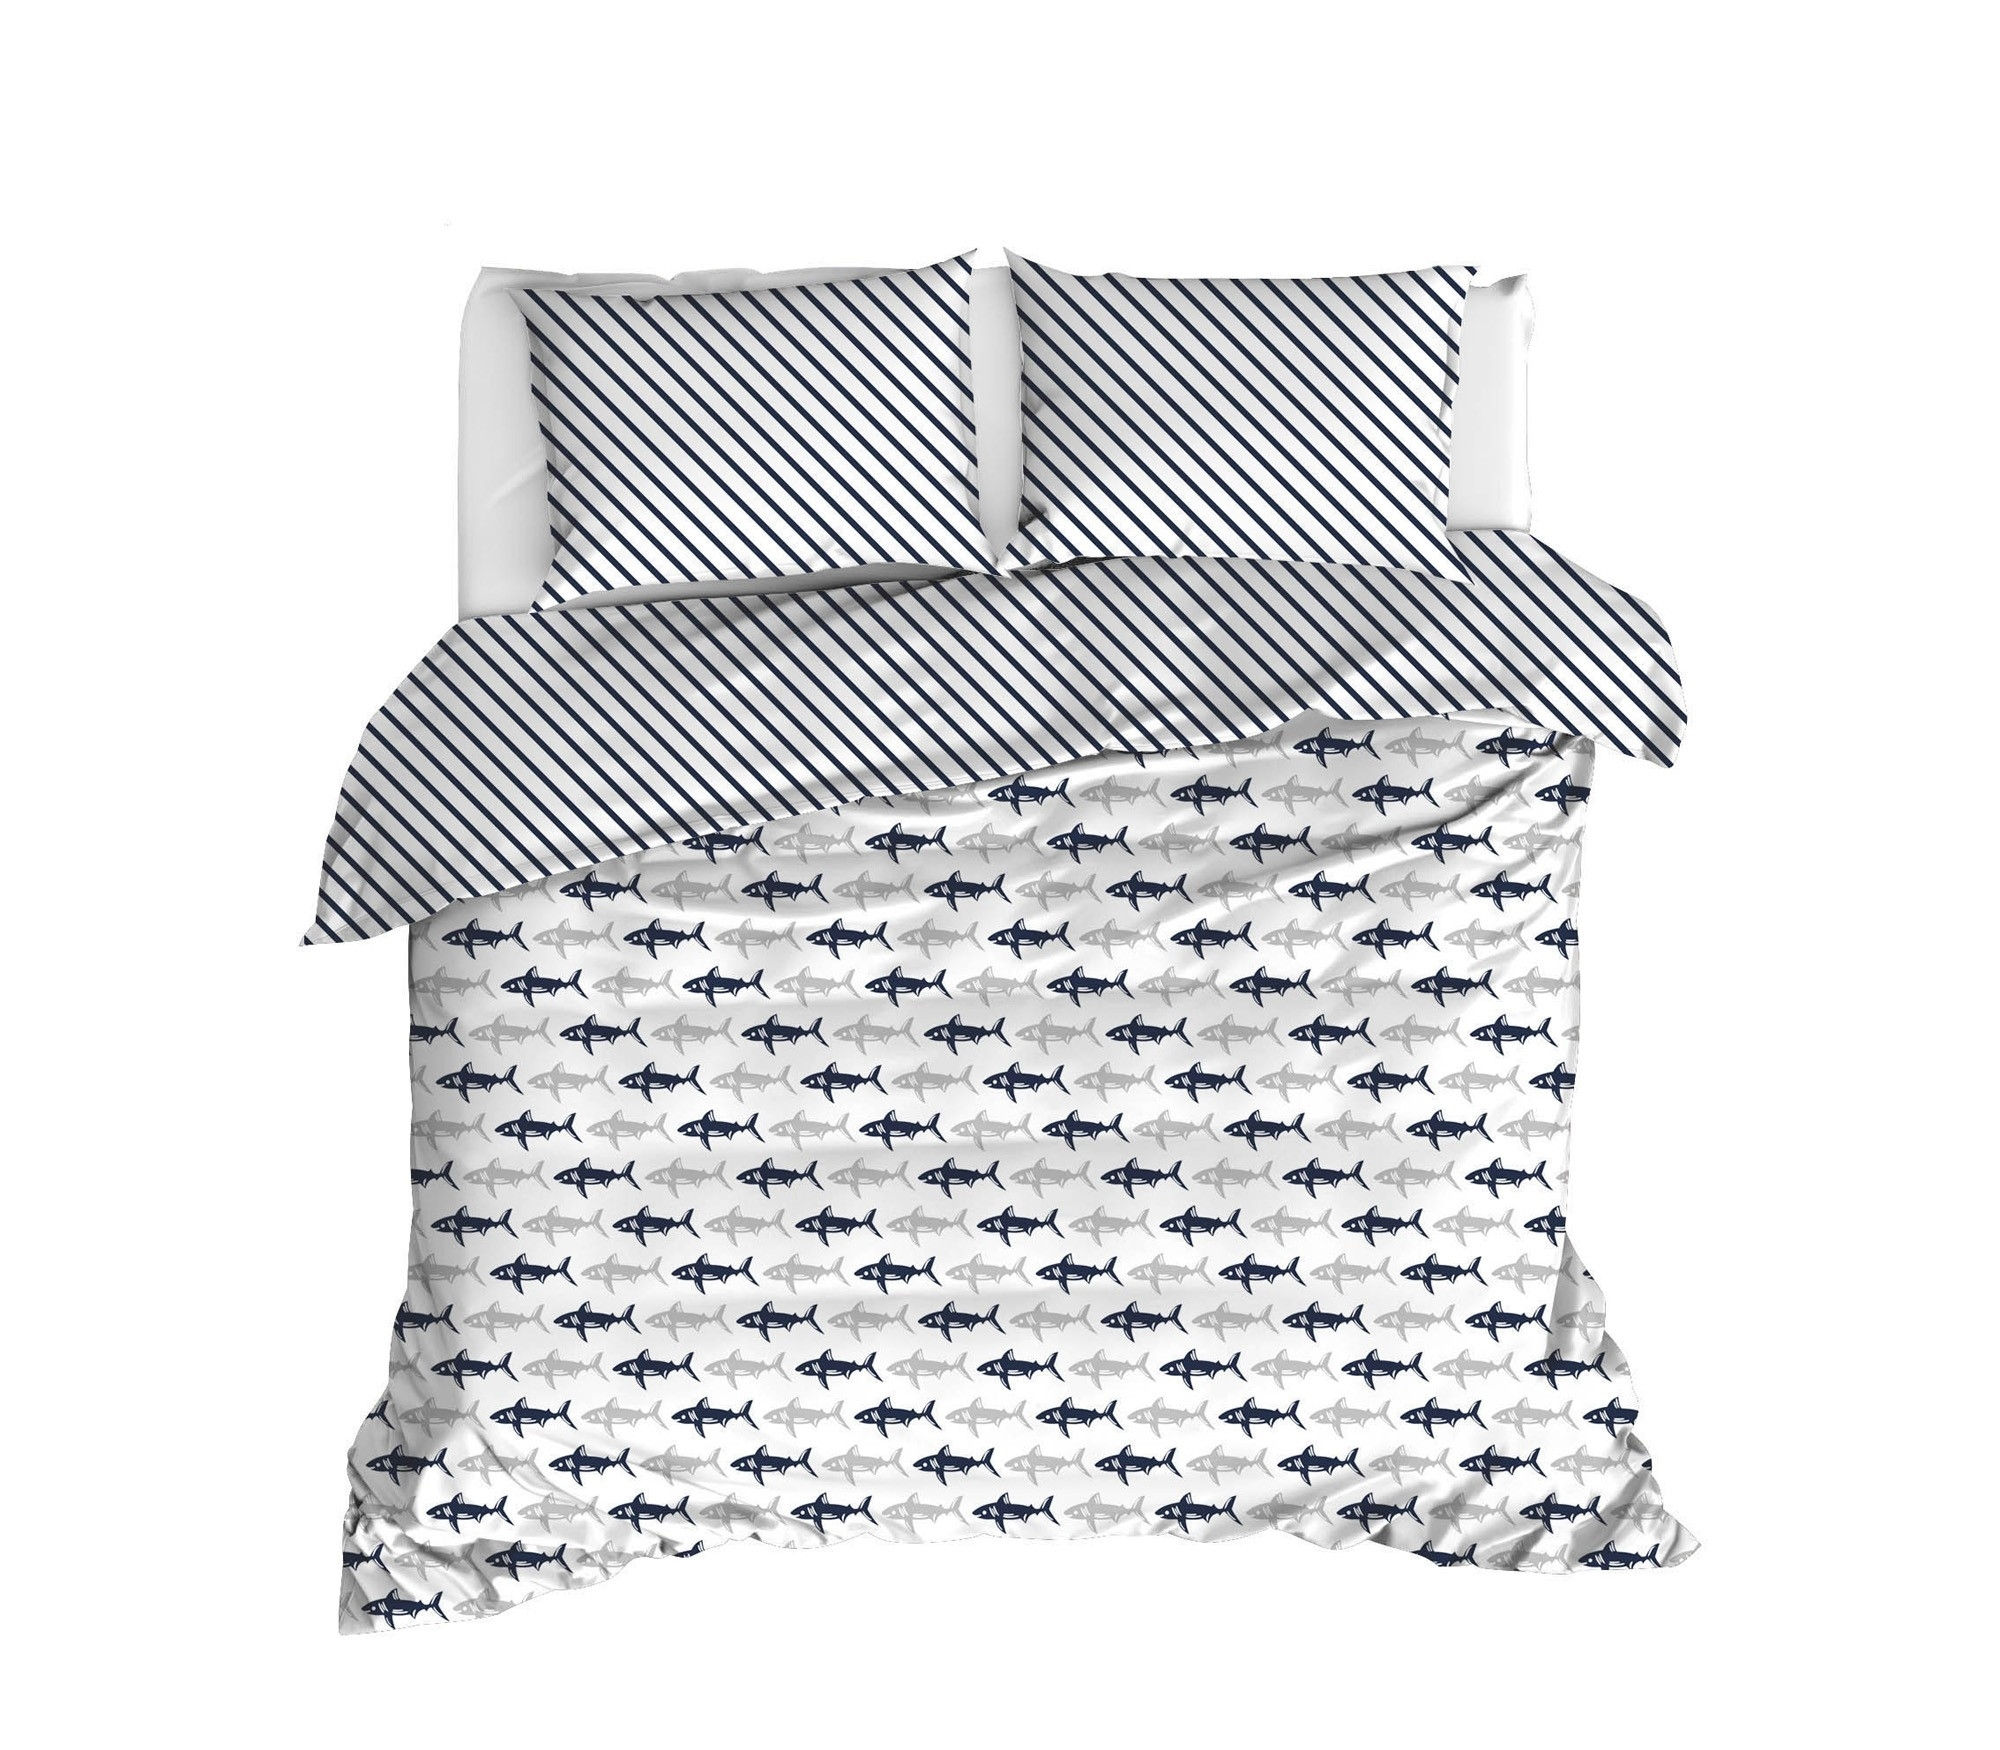 Lenjerie de pat din bumbac Ranforce Shark Bleumarin / Alb, 200 x 220 cm imagine